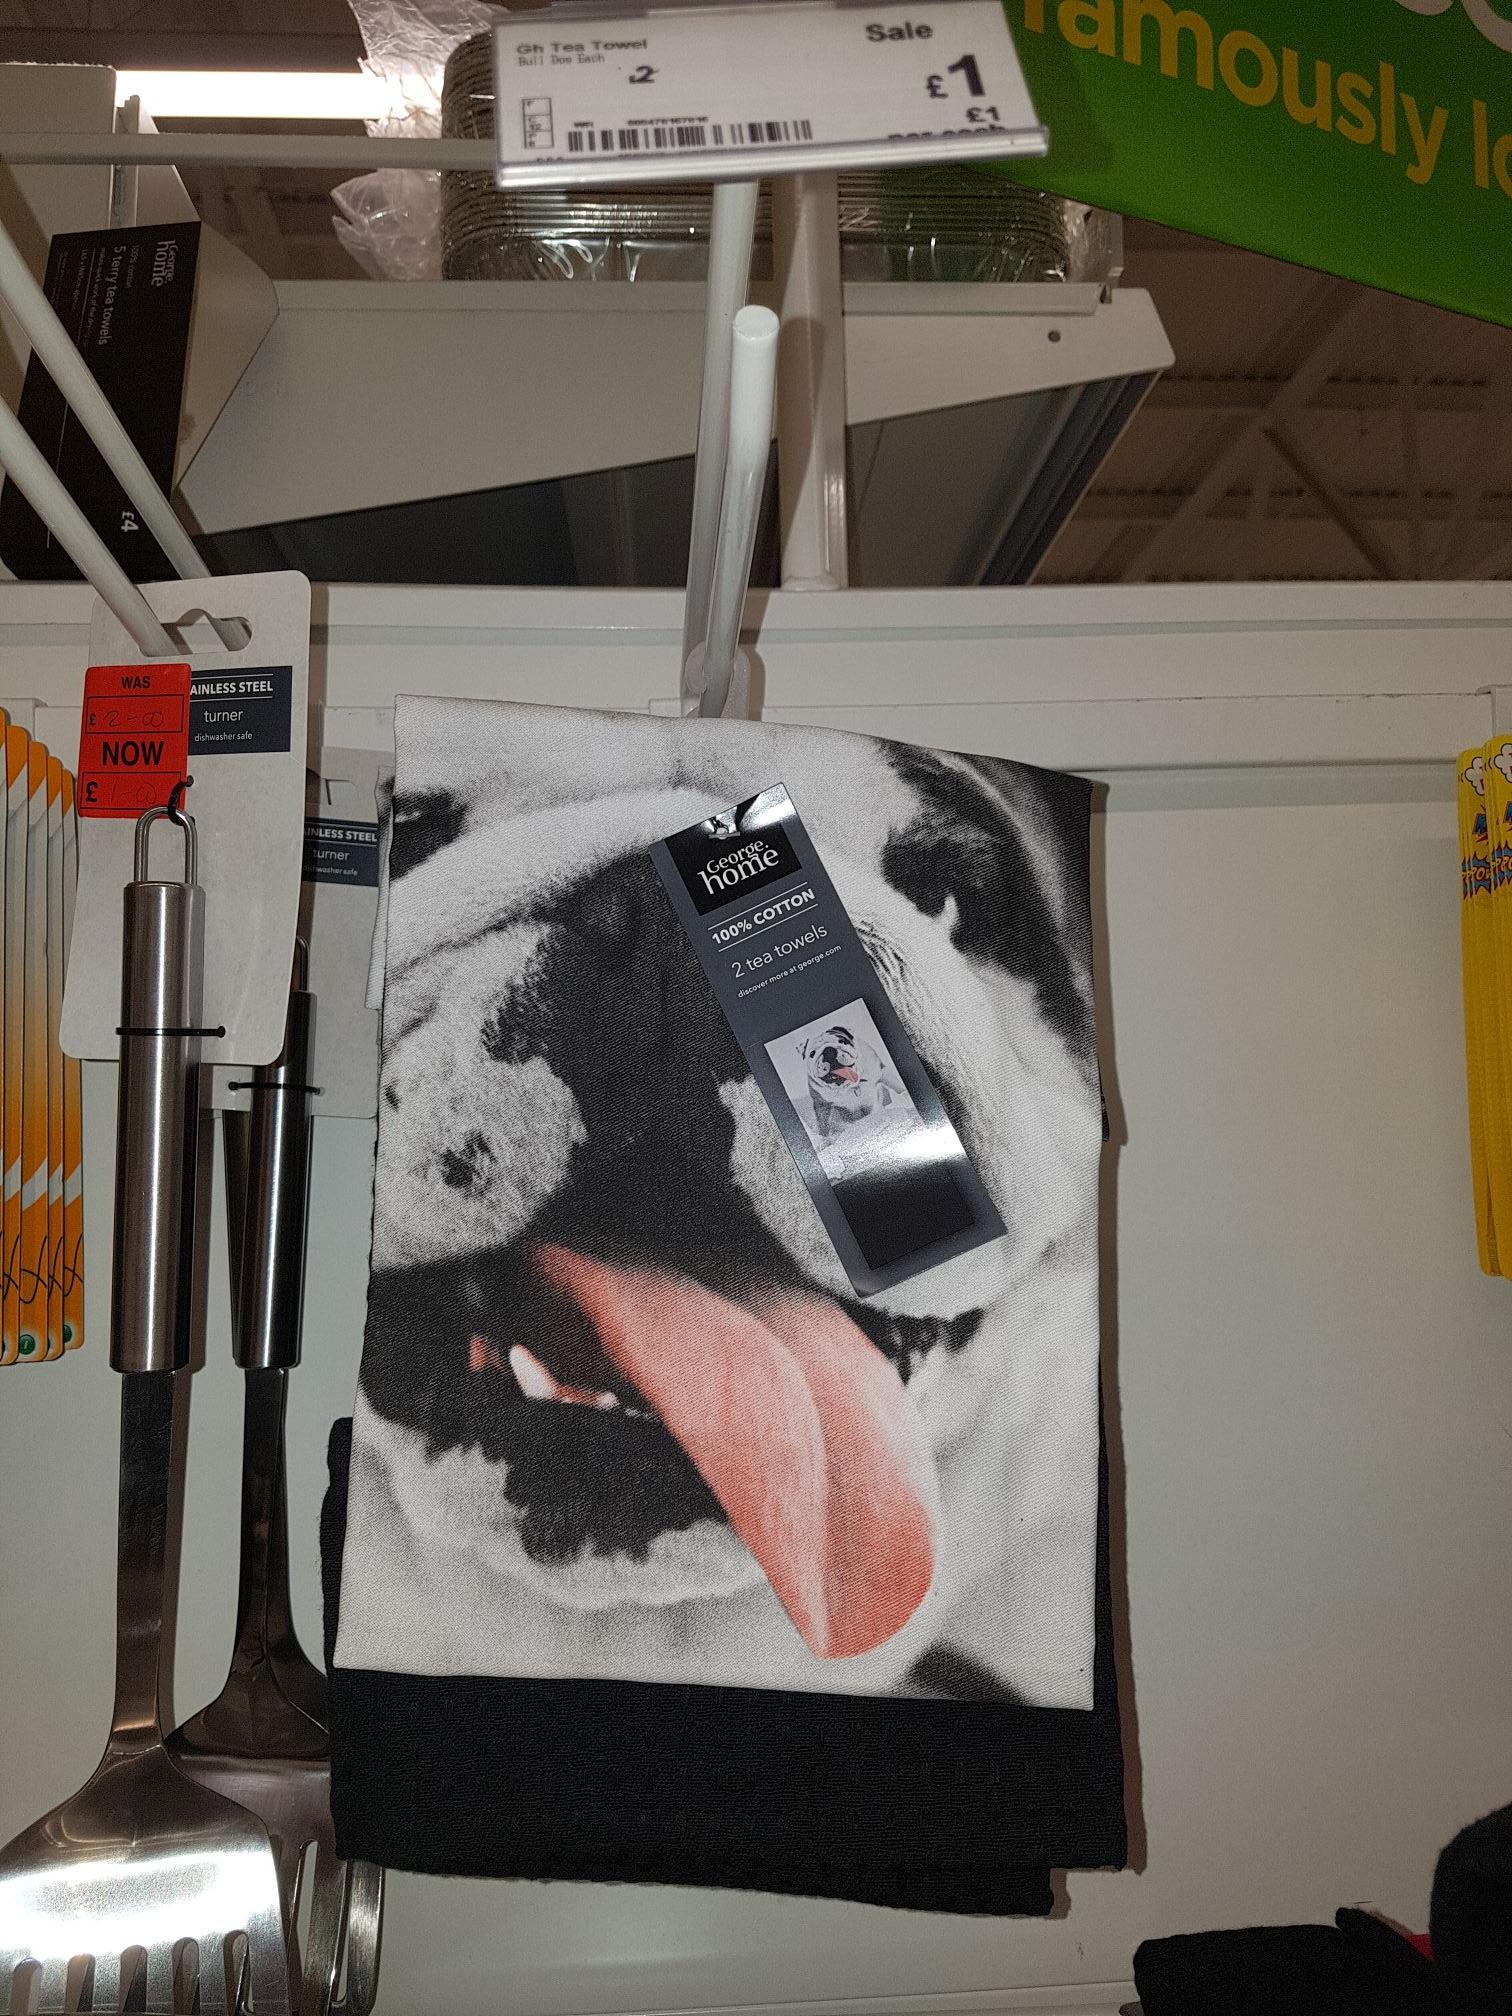 George HOME dog tea towels £1 at Asda instore